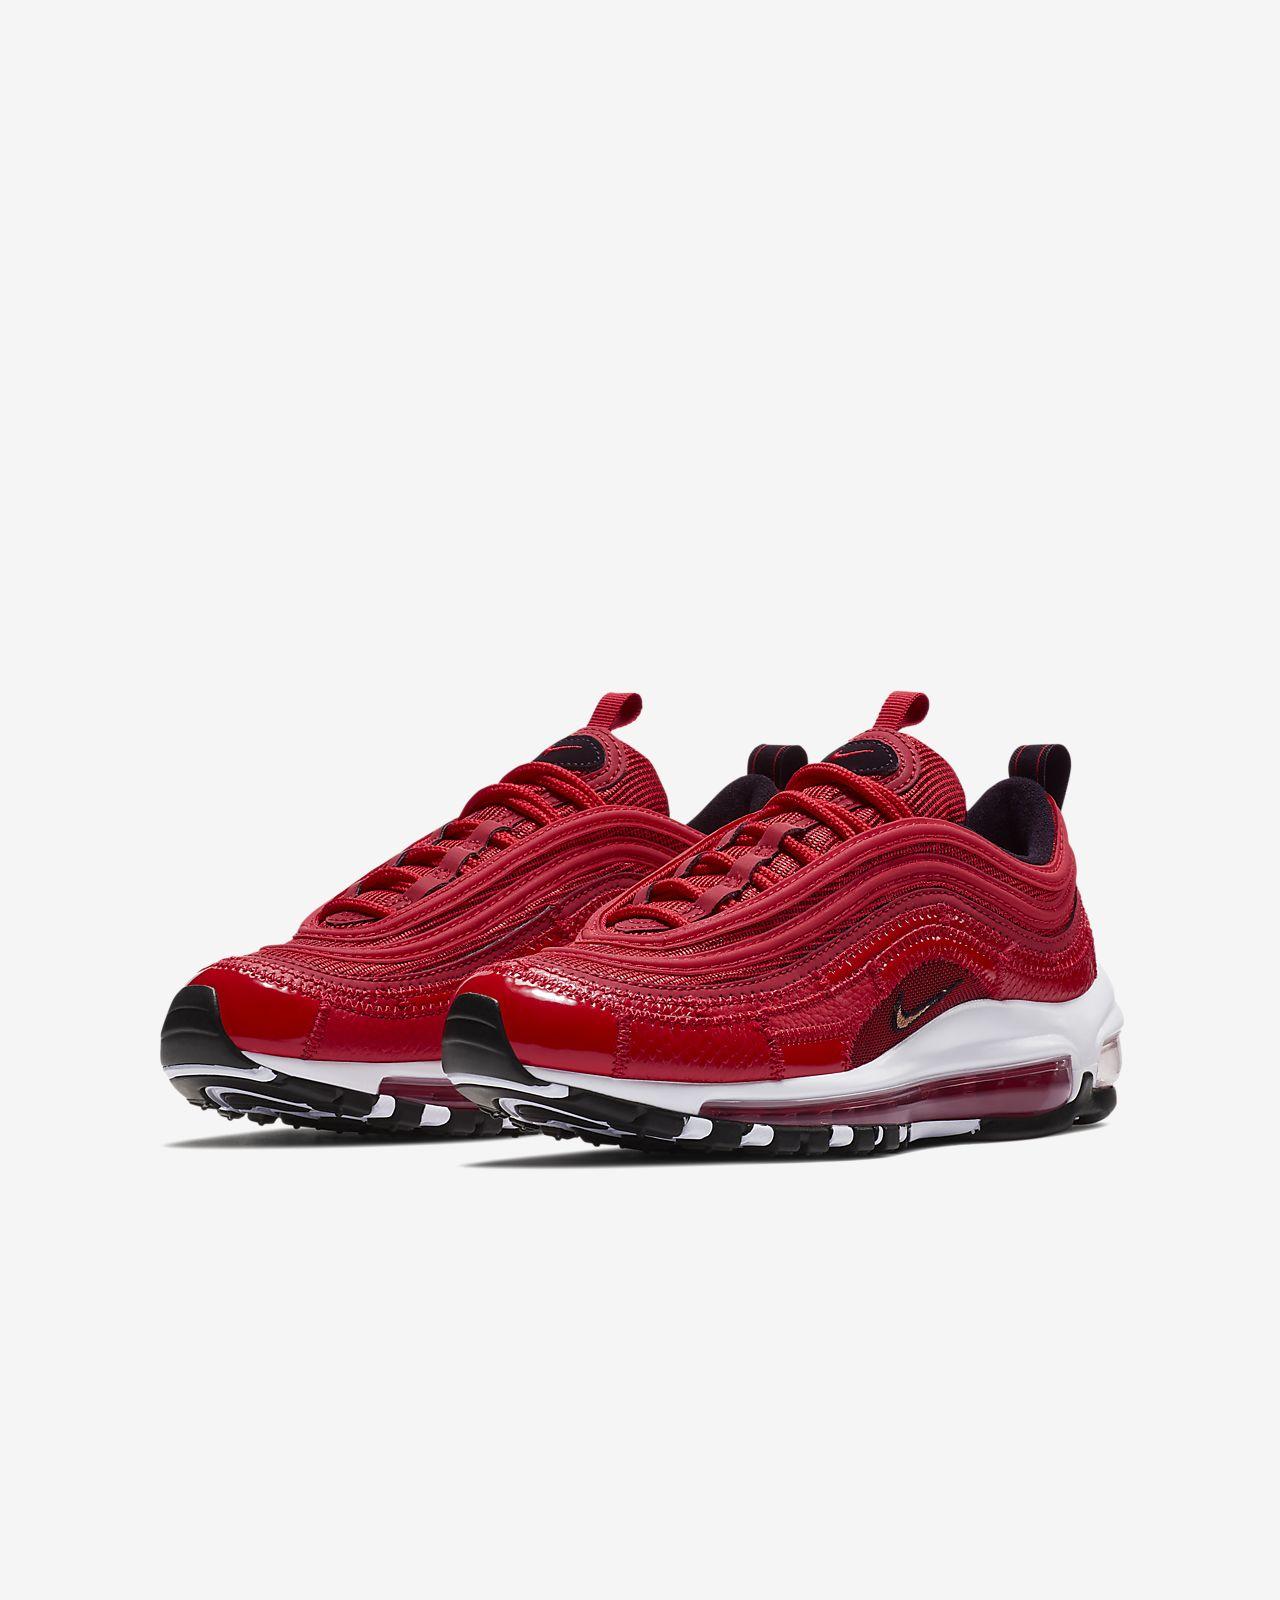 nike air max 97 ultra '17 women's shoe red nz